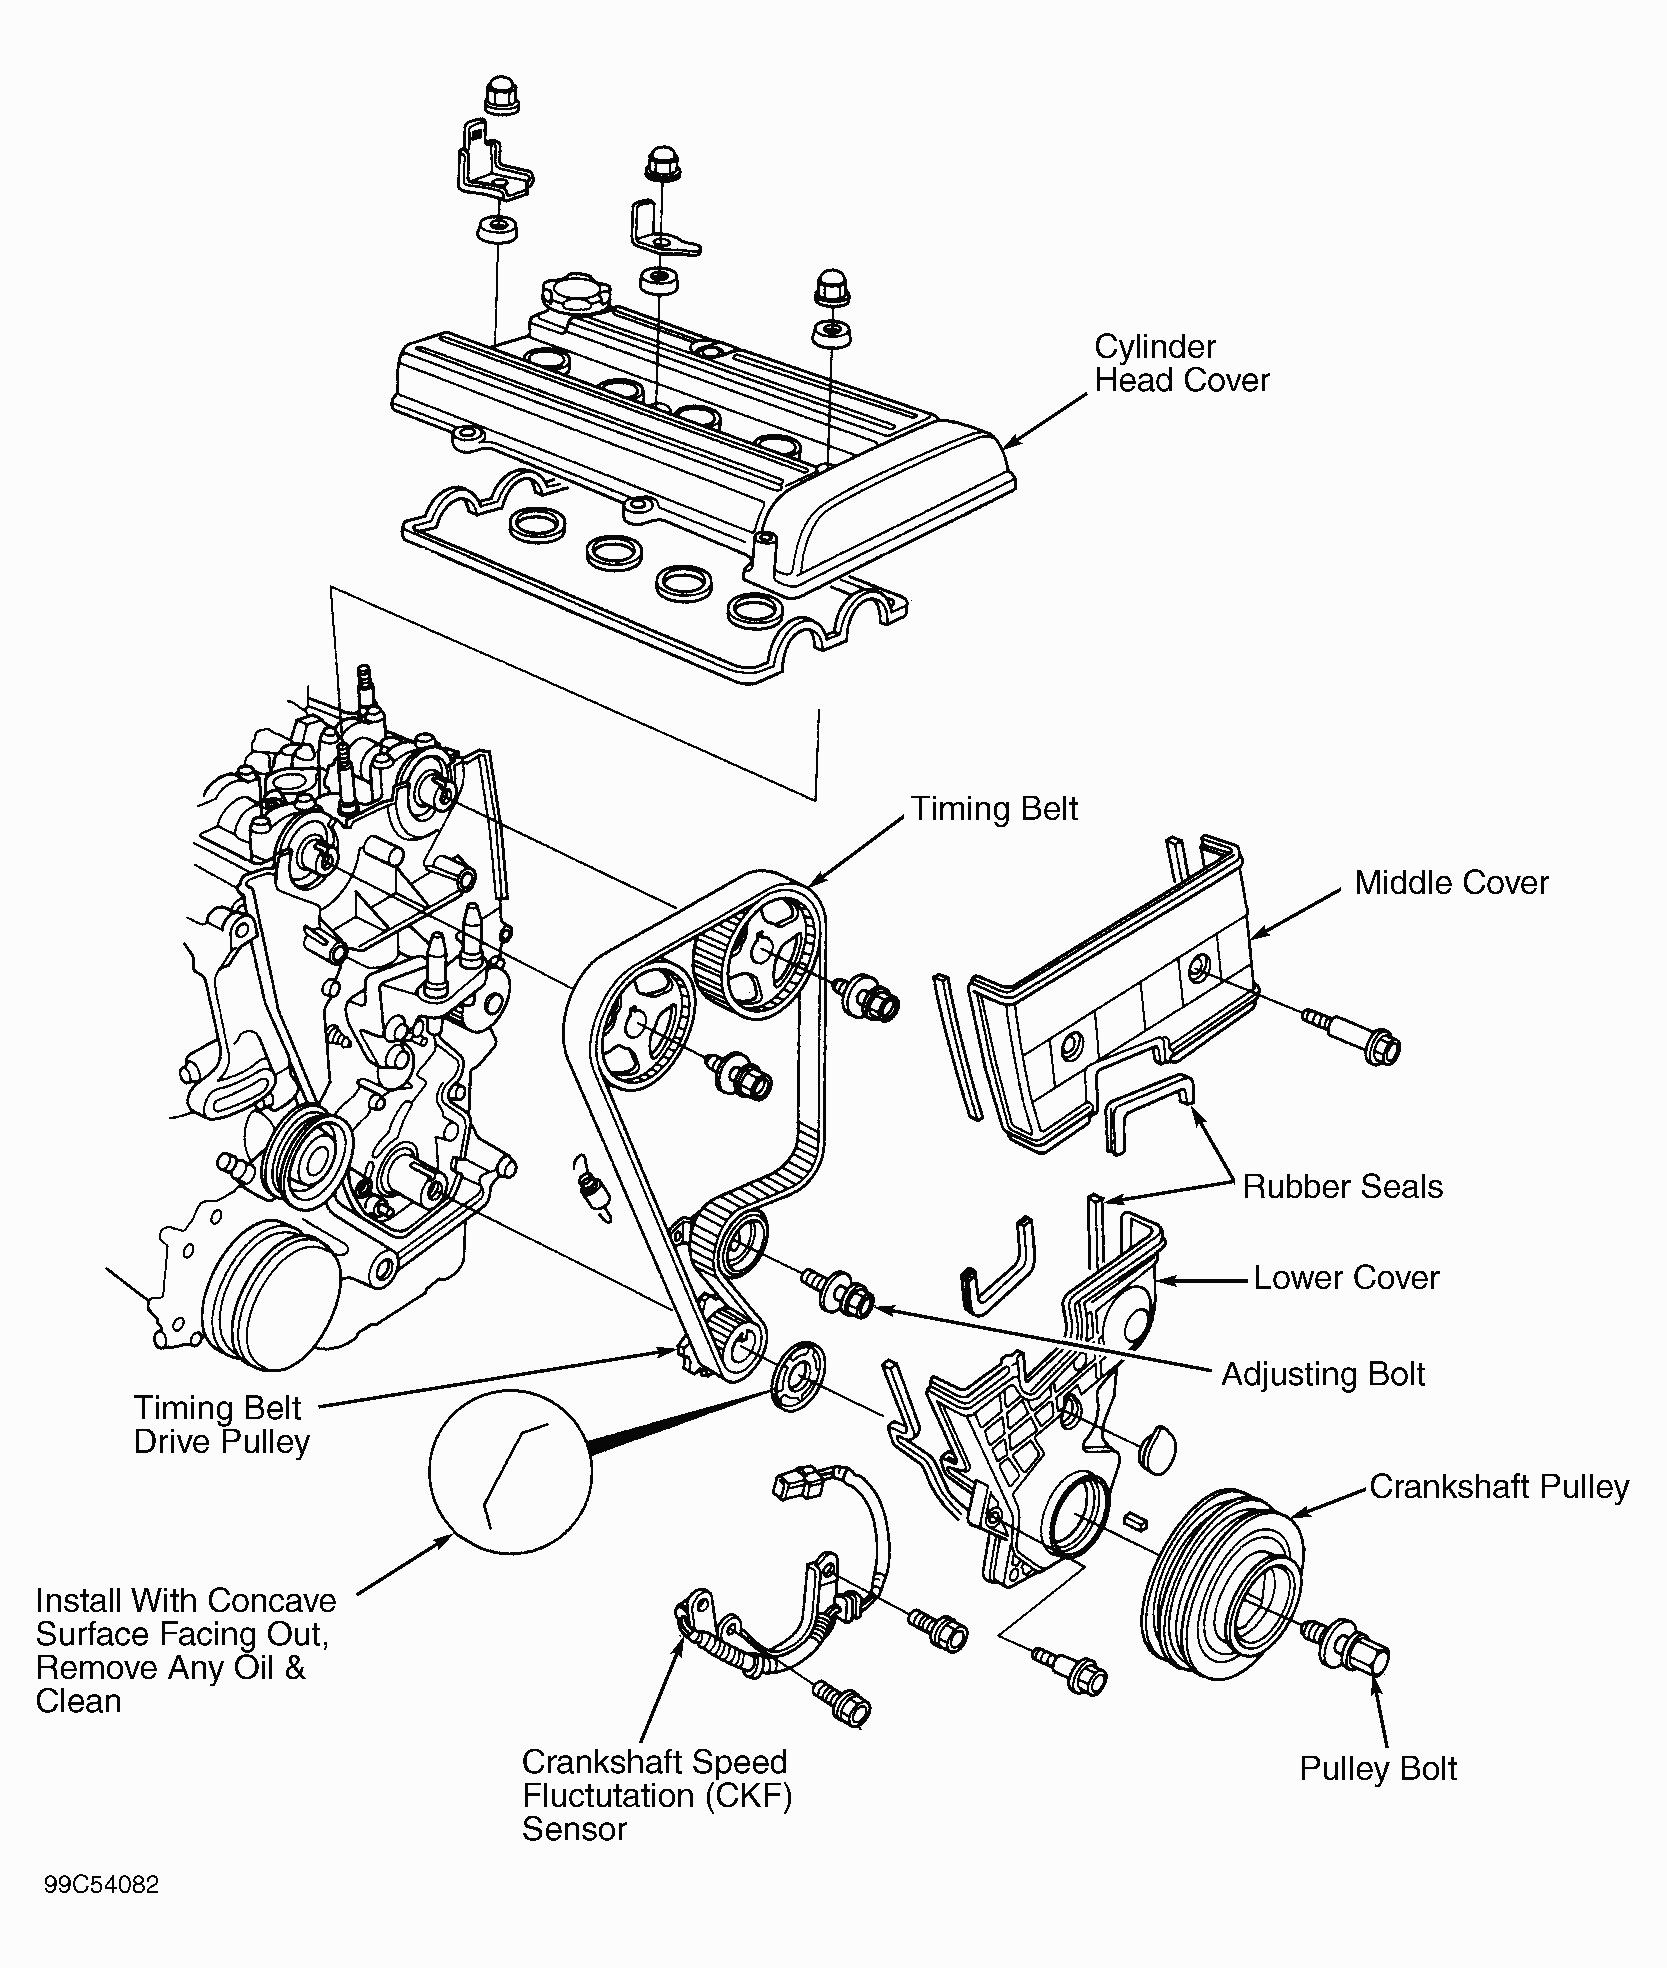 b18 engine wiring diagram